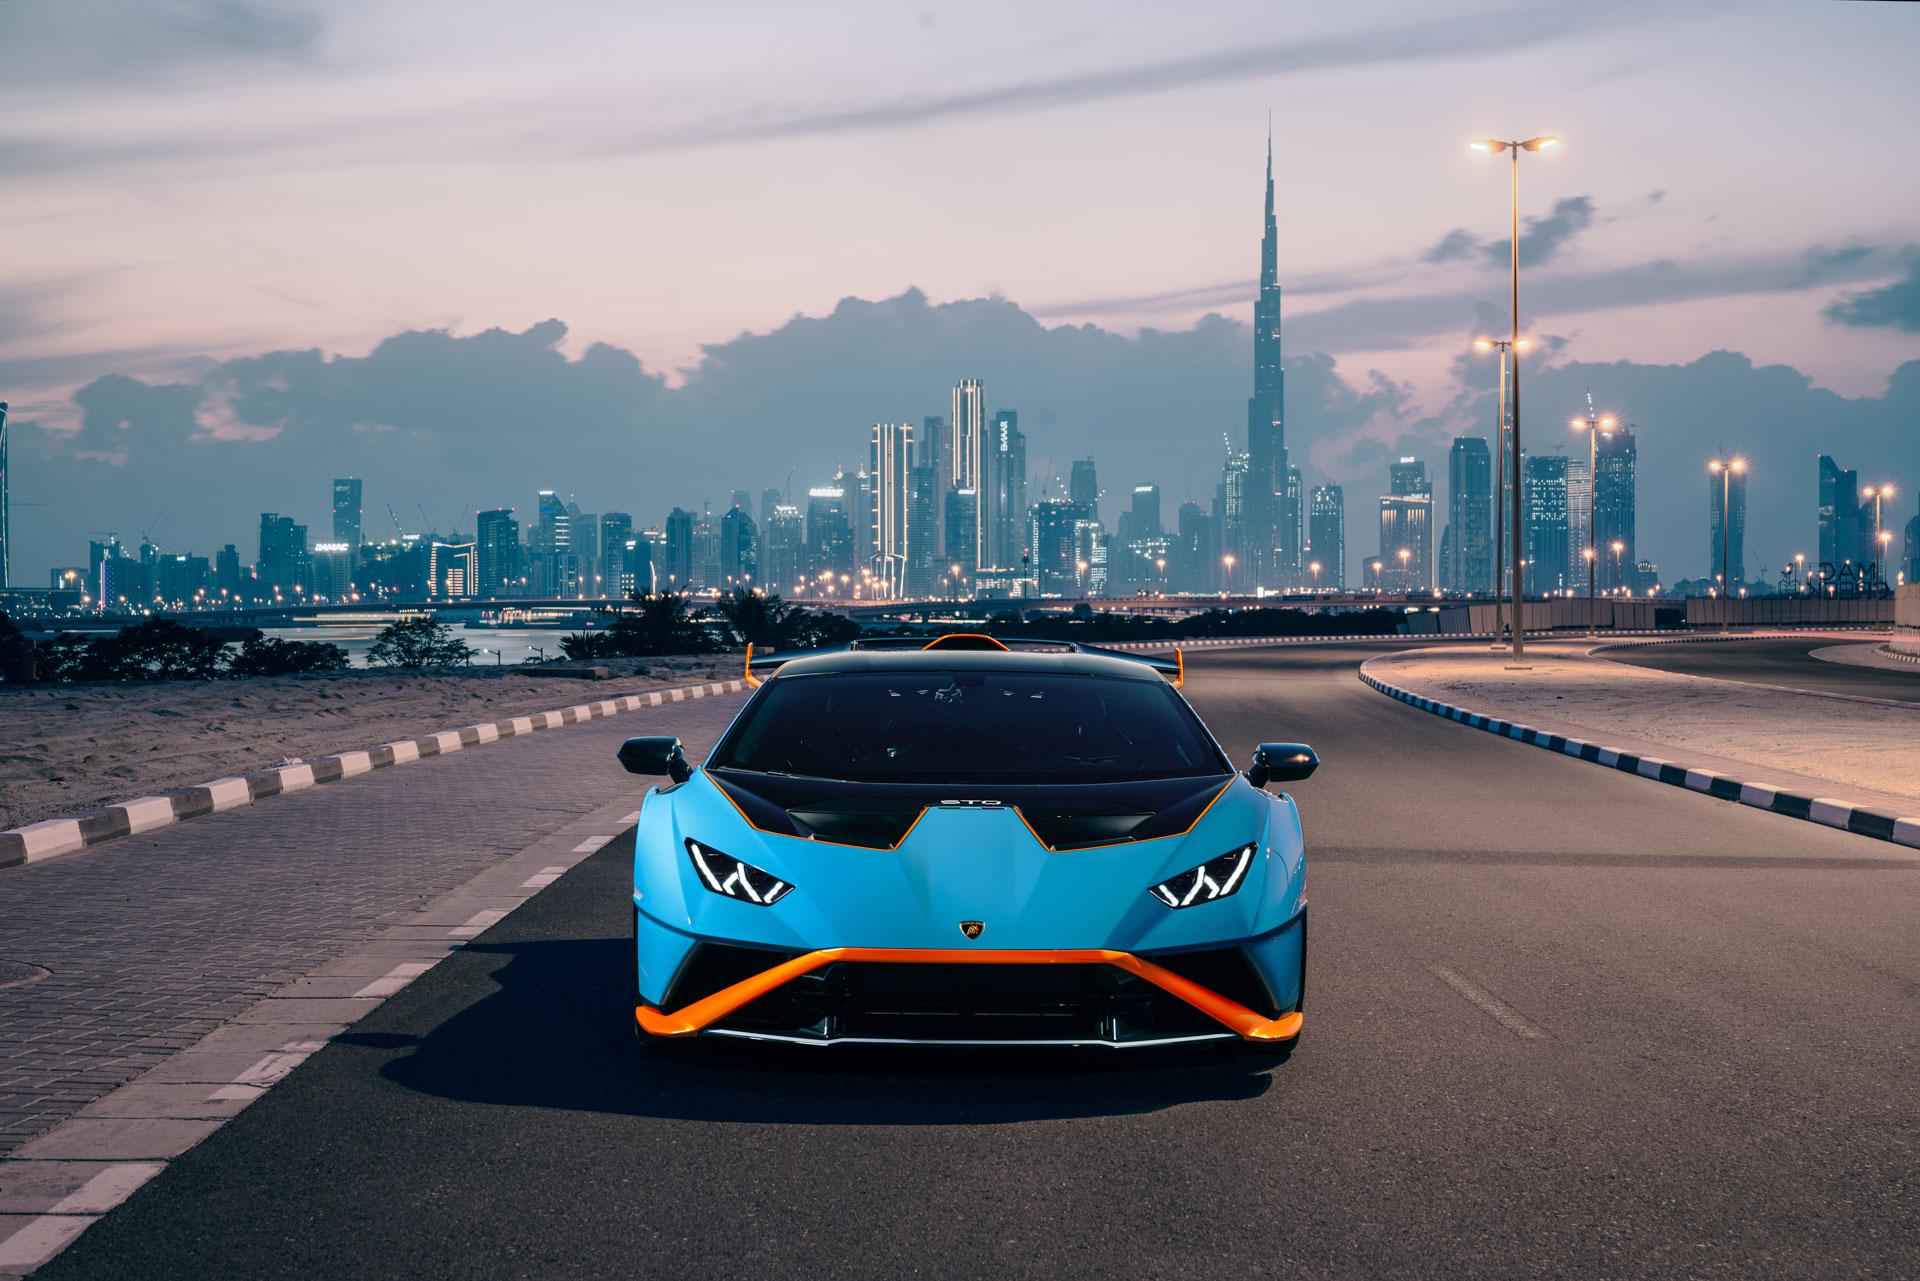 Automobili Lamborghini Unveils New Huracán STO in the UAE